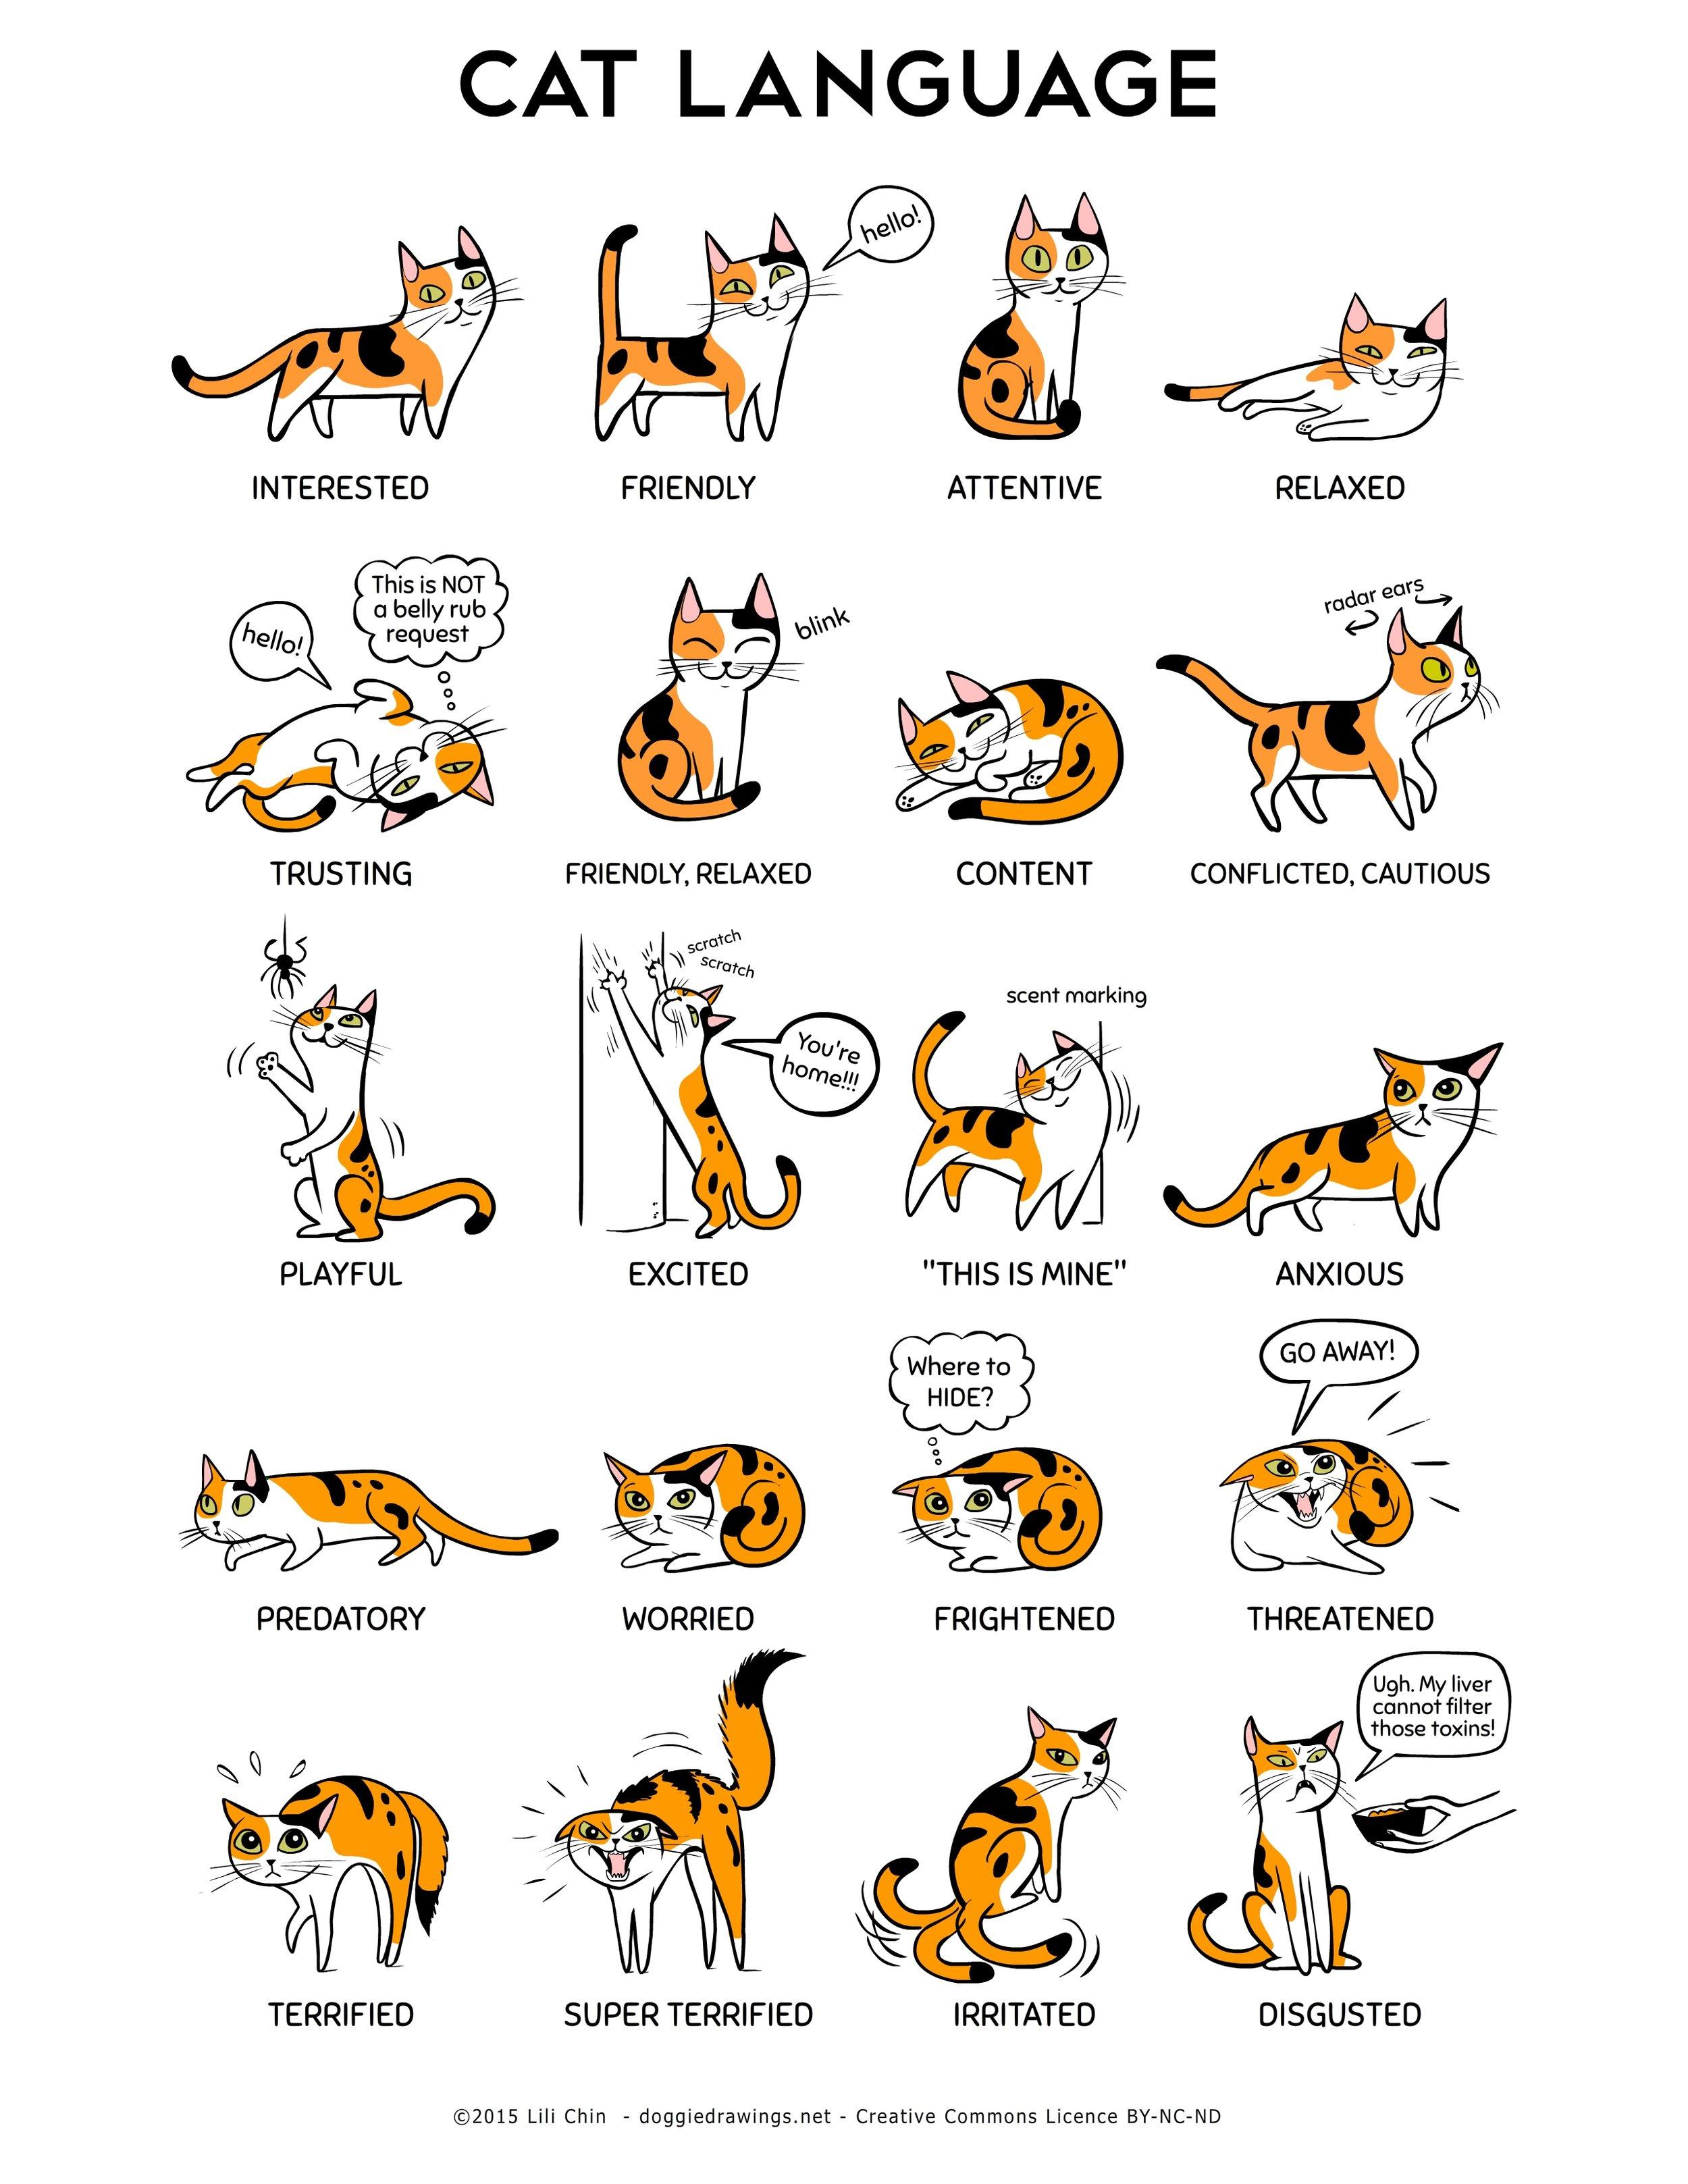 Clarendon Animal Care Veterinary Clinic Arlington Virginia Assistant cat language fear free chart